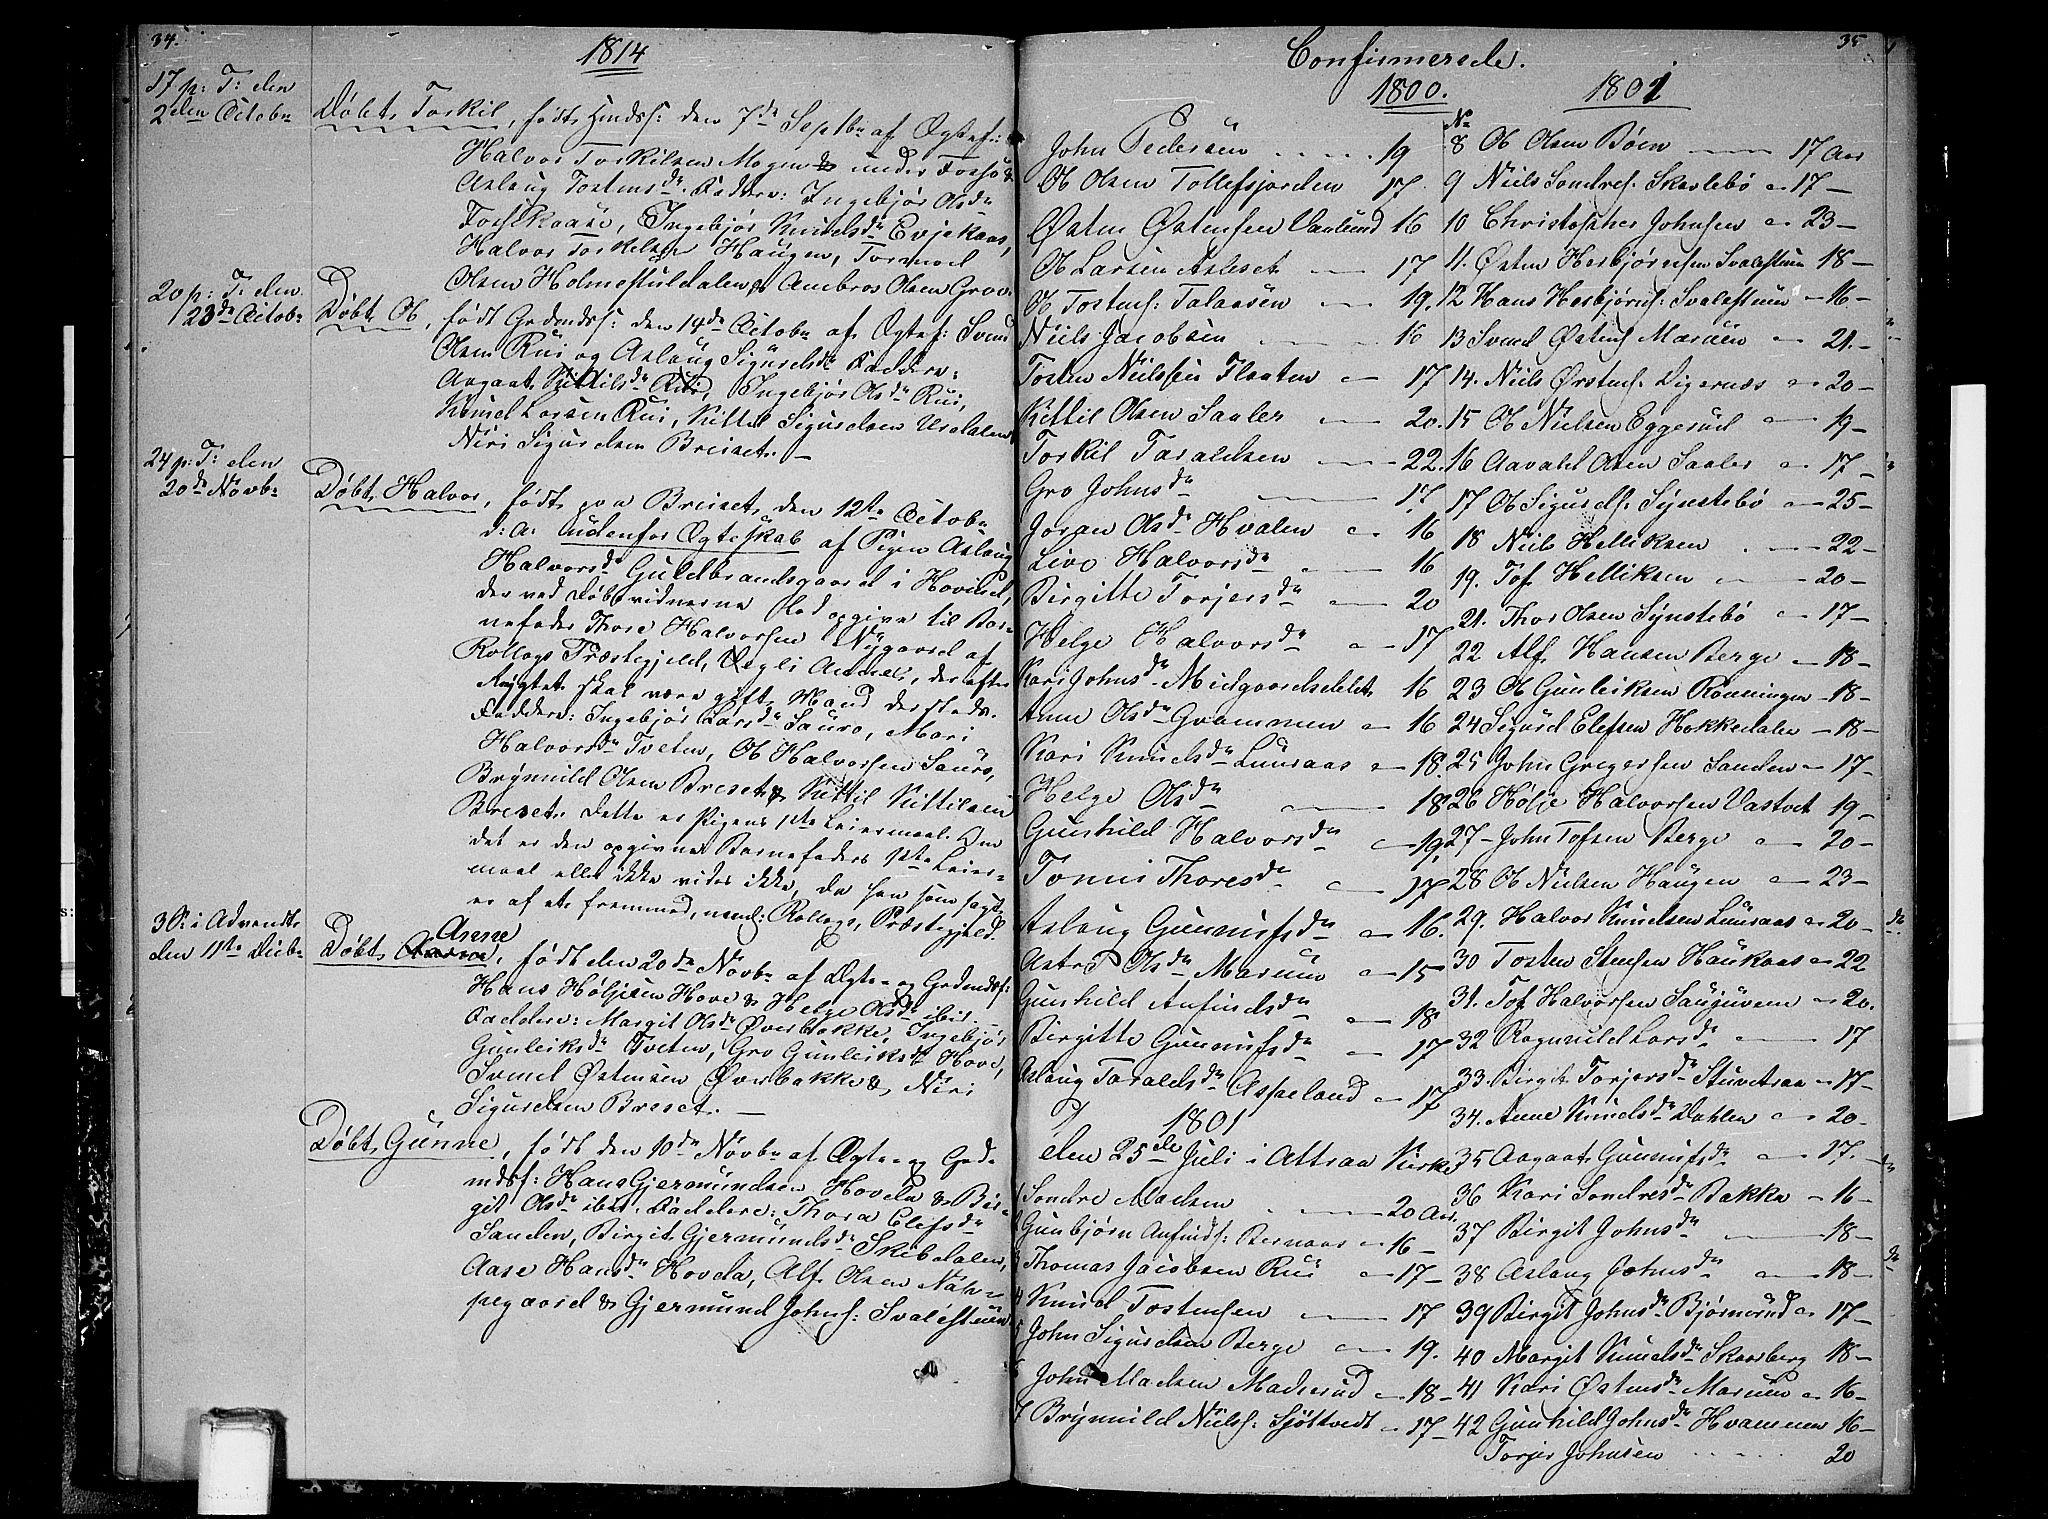 SAKO, Gransherad kirkebøker, F/Fb/L0001: Ministerialbok nr. II 1, 1800-1814, s. 34-35